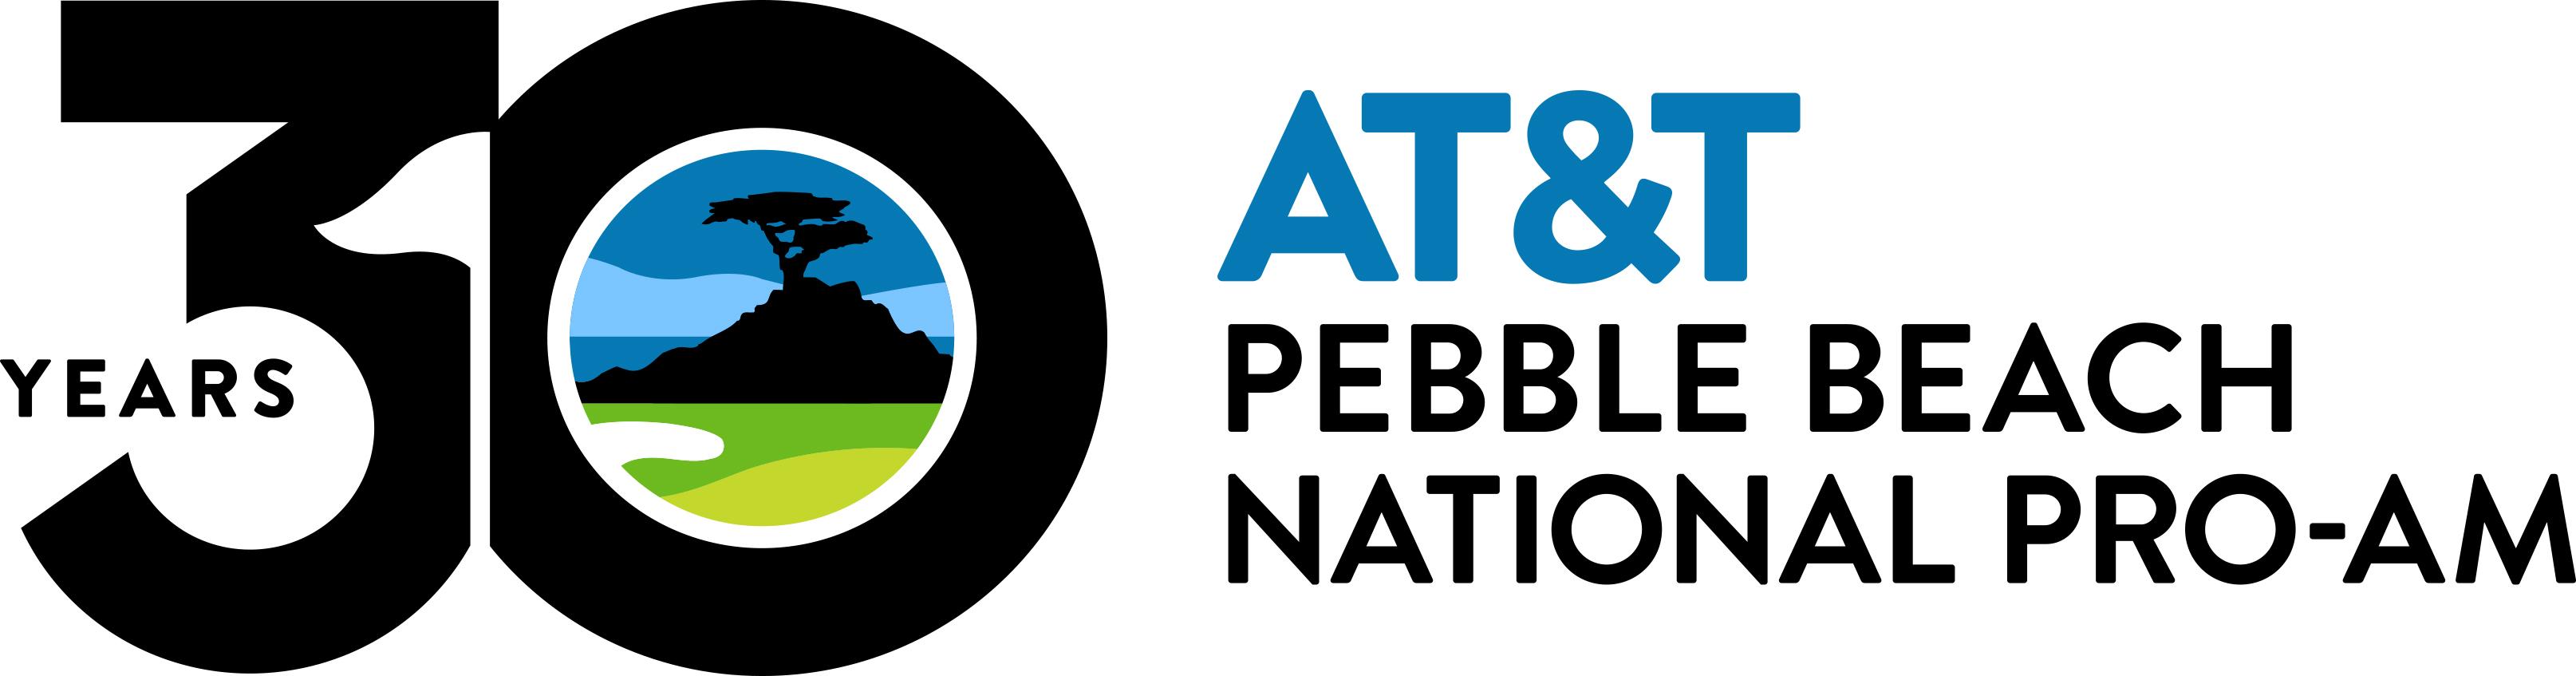 At T Pebble Beach National Pro Am Logo